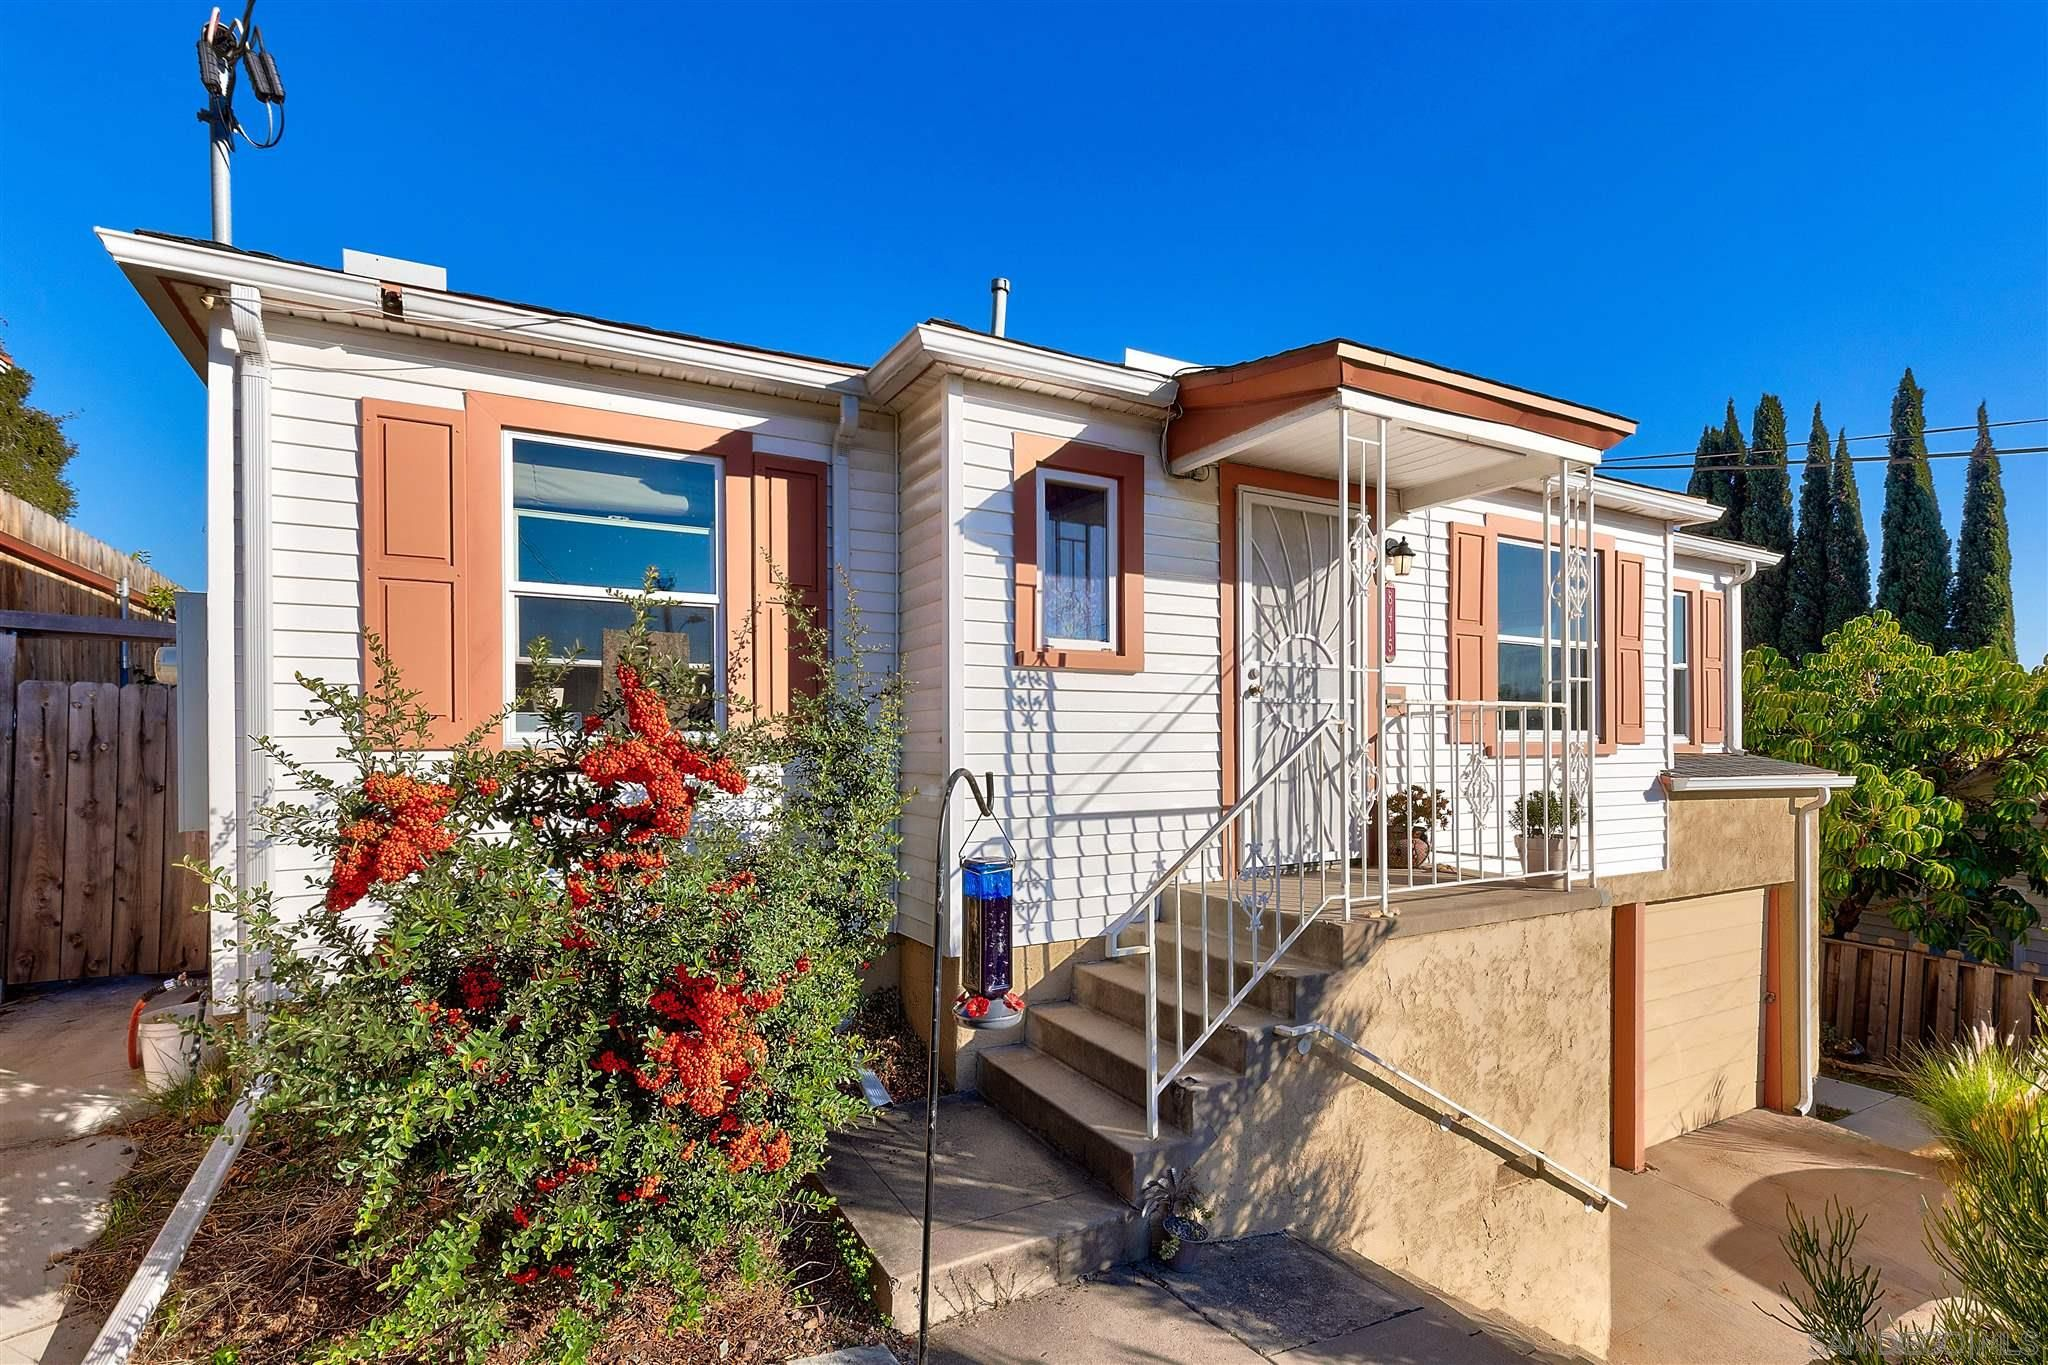 Main Photo: LA MESA House for sale : 3 bedrooms : 8415 Sunrise